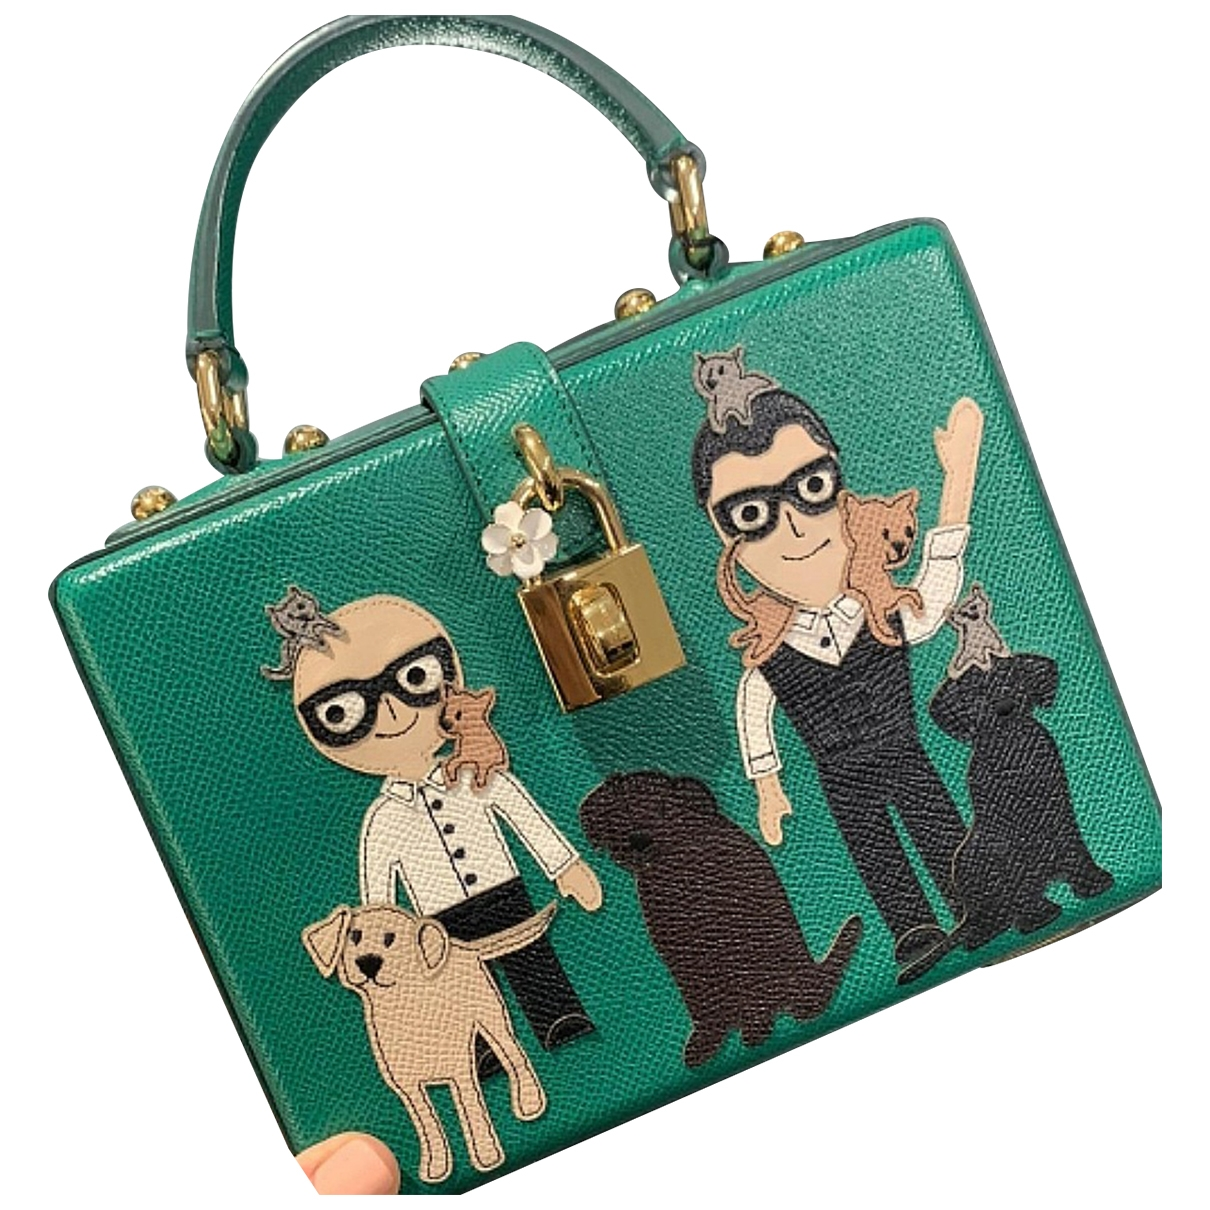 Dolce & Gabbana - Sac a main   pour femme en cuir - vert